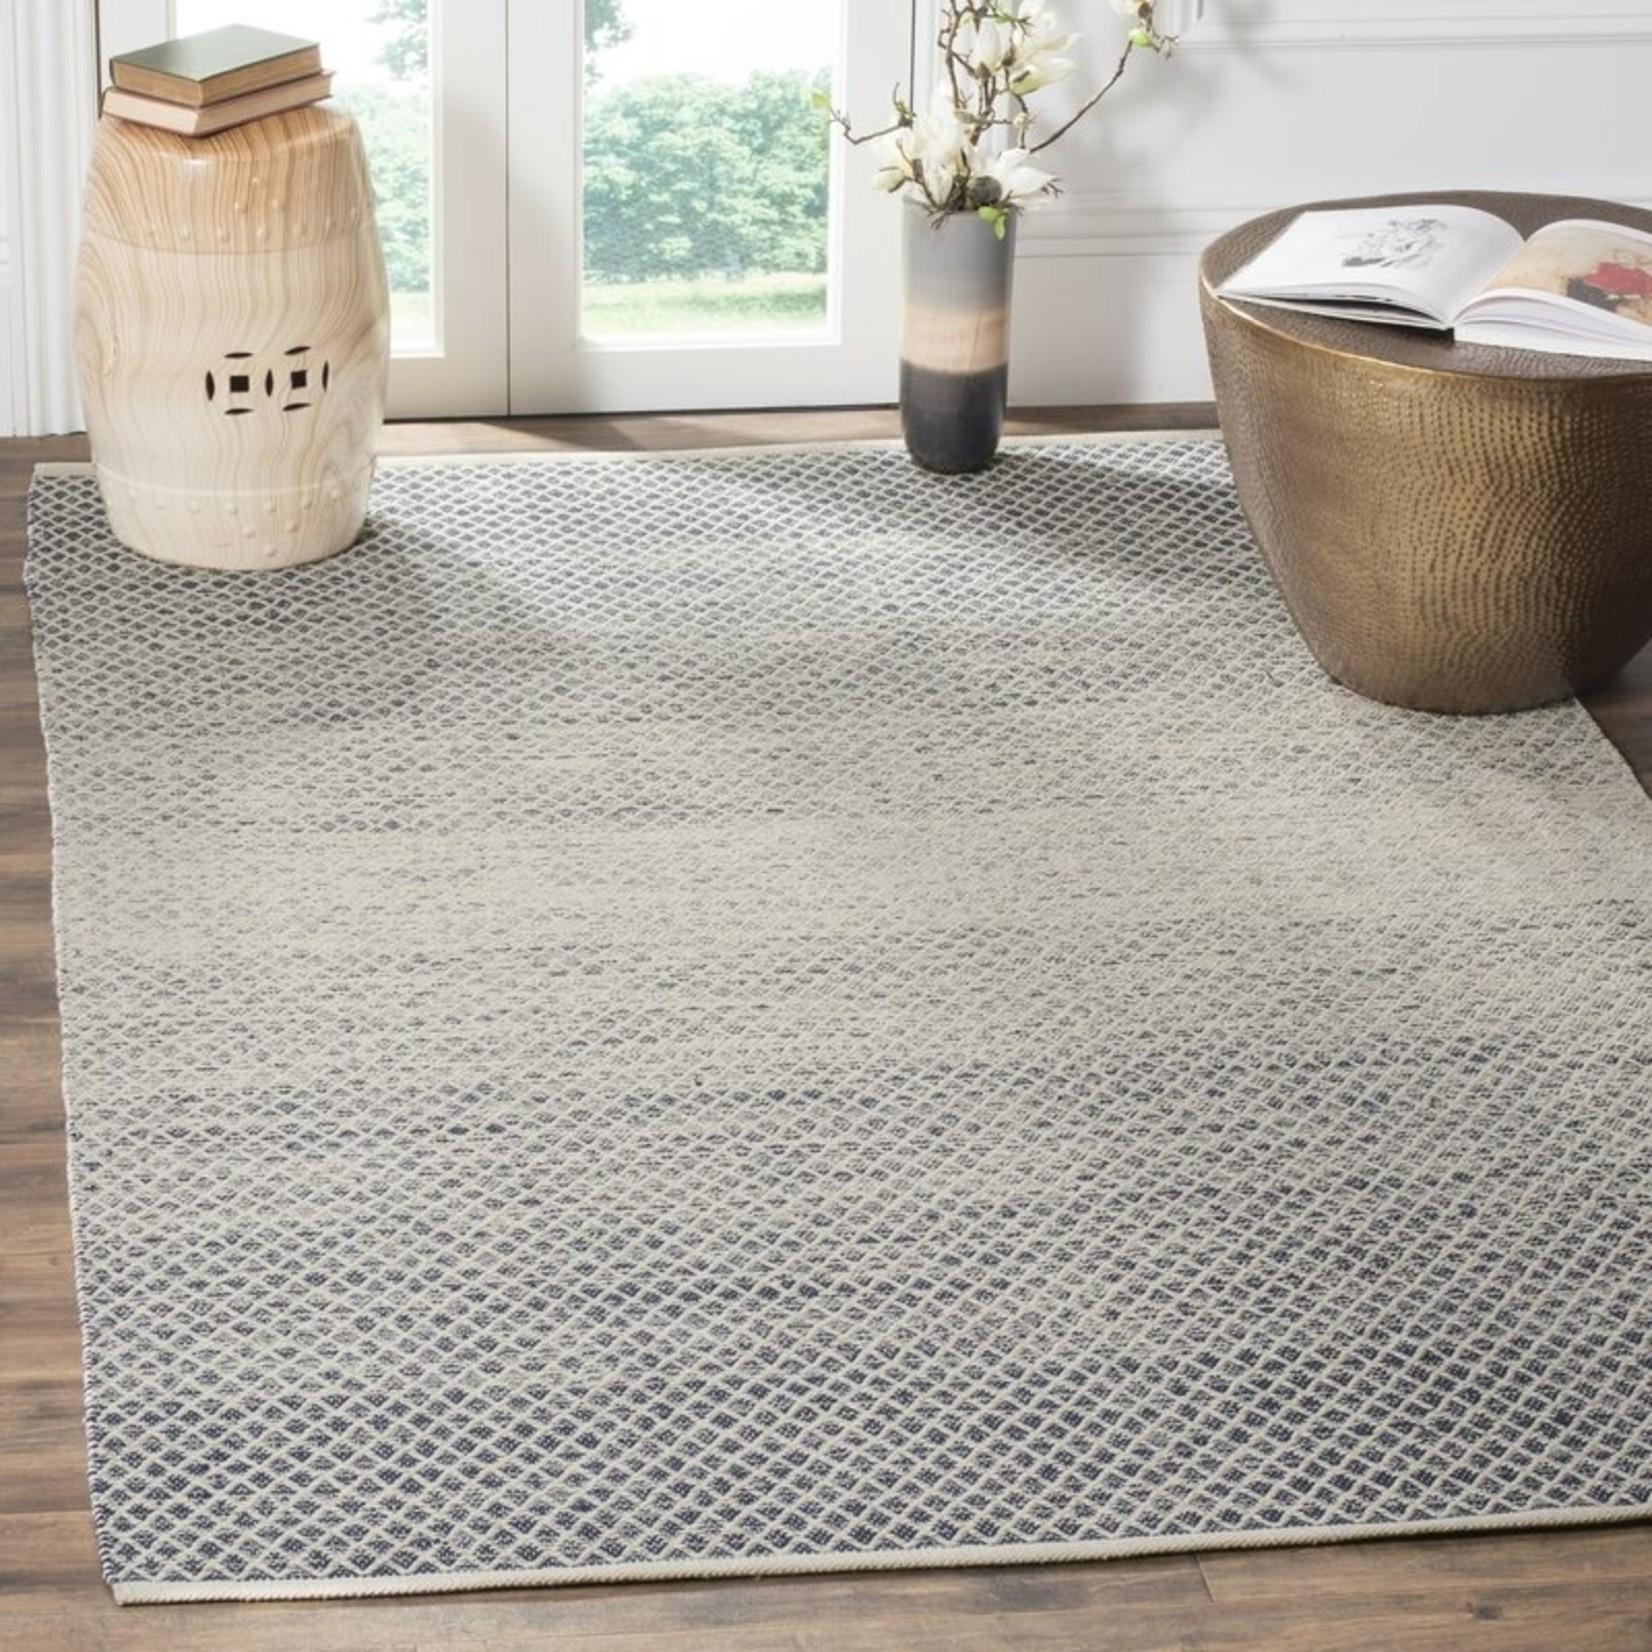 *3' x 5' - Saleem Geometric Handmade Flatweave Cotton Navy/Ivory Area Rug